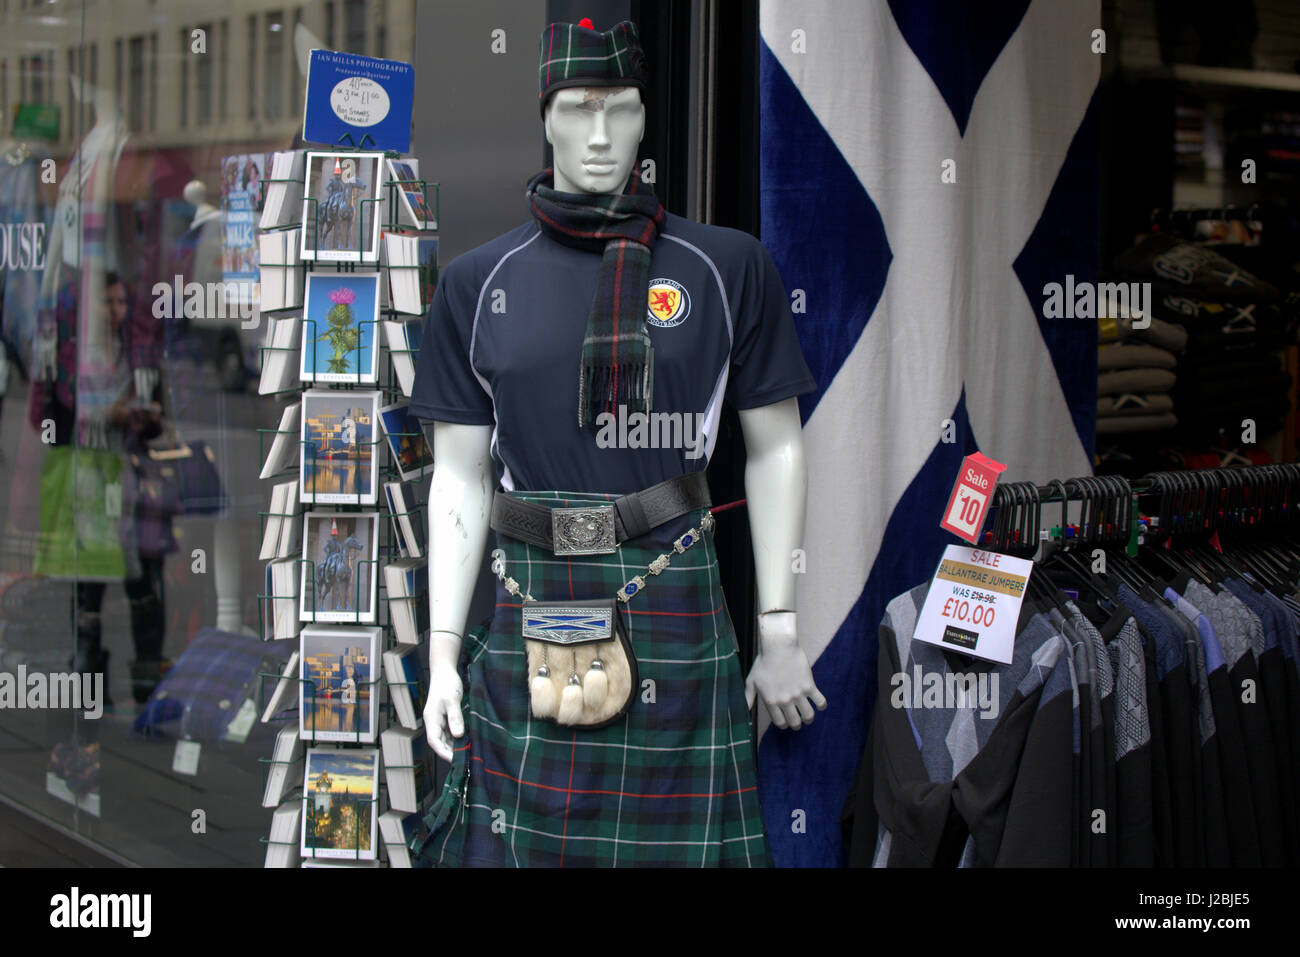 Scotland flag rugby shirt kilt sporran kitsch  6 nations shirt flag postcards shop window - Stock Image